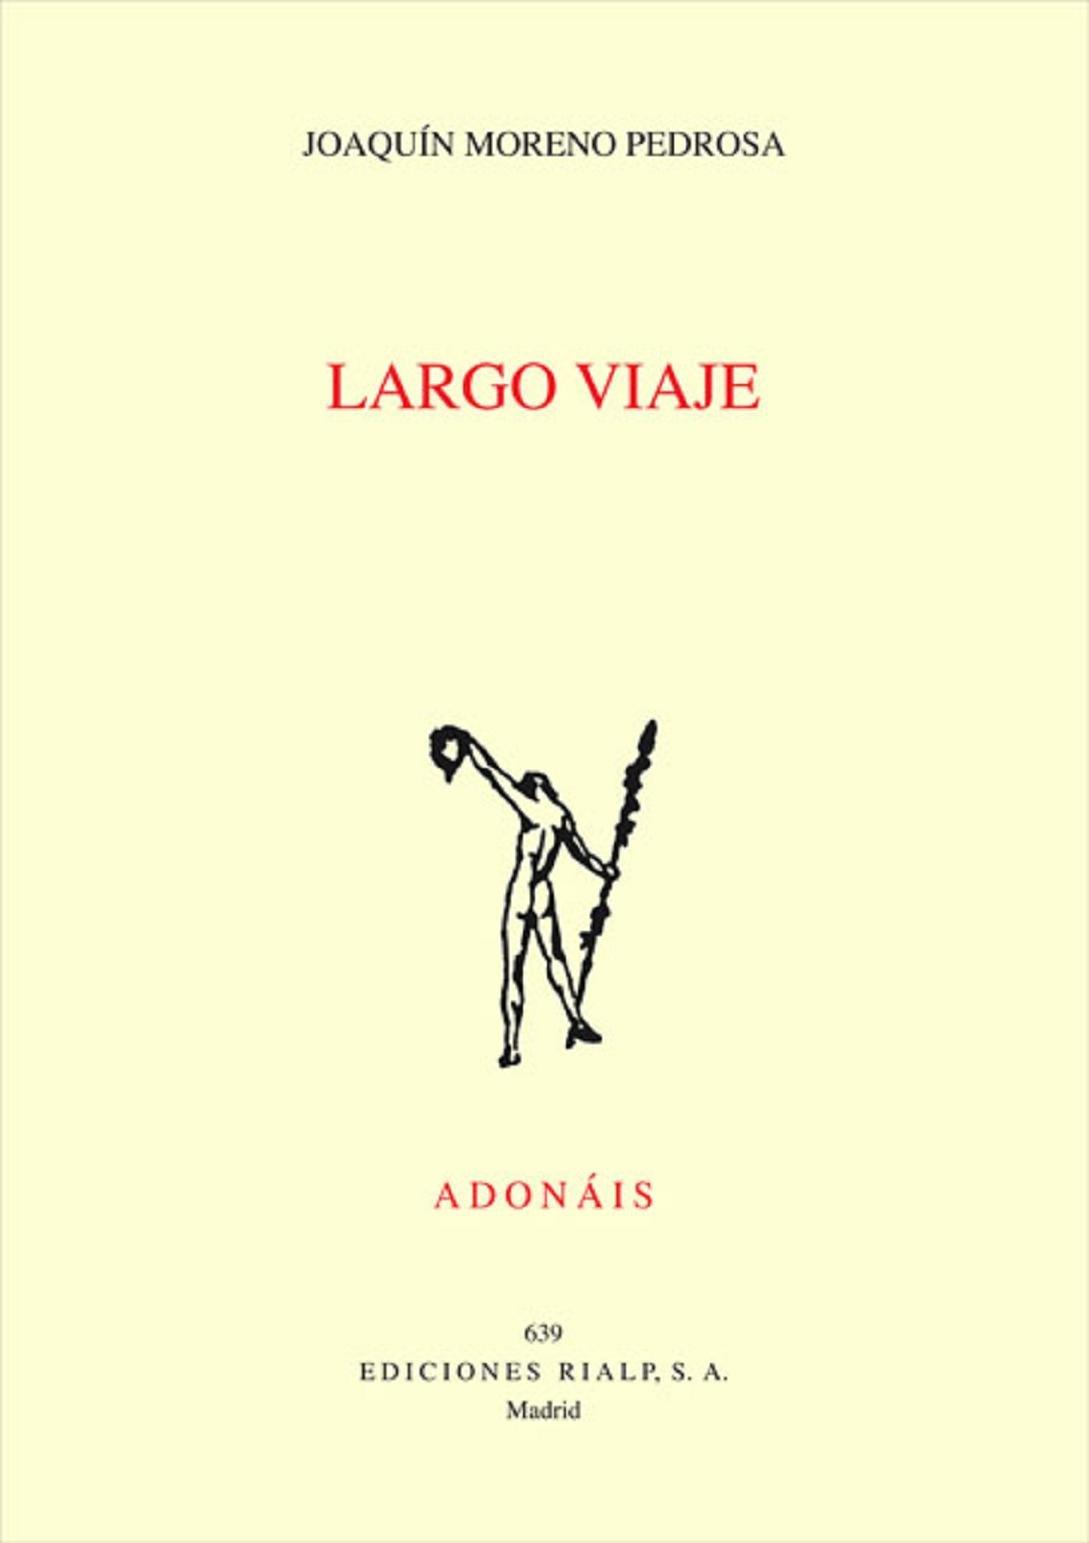 Largo viaje (Premio Adonáis): Amazon.es: Moreno Pedrosa, Joaquín ...